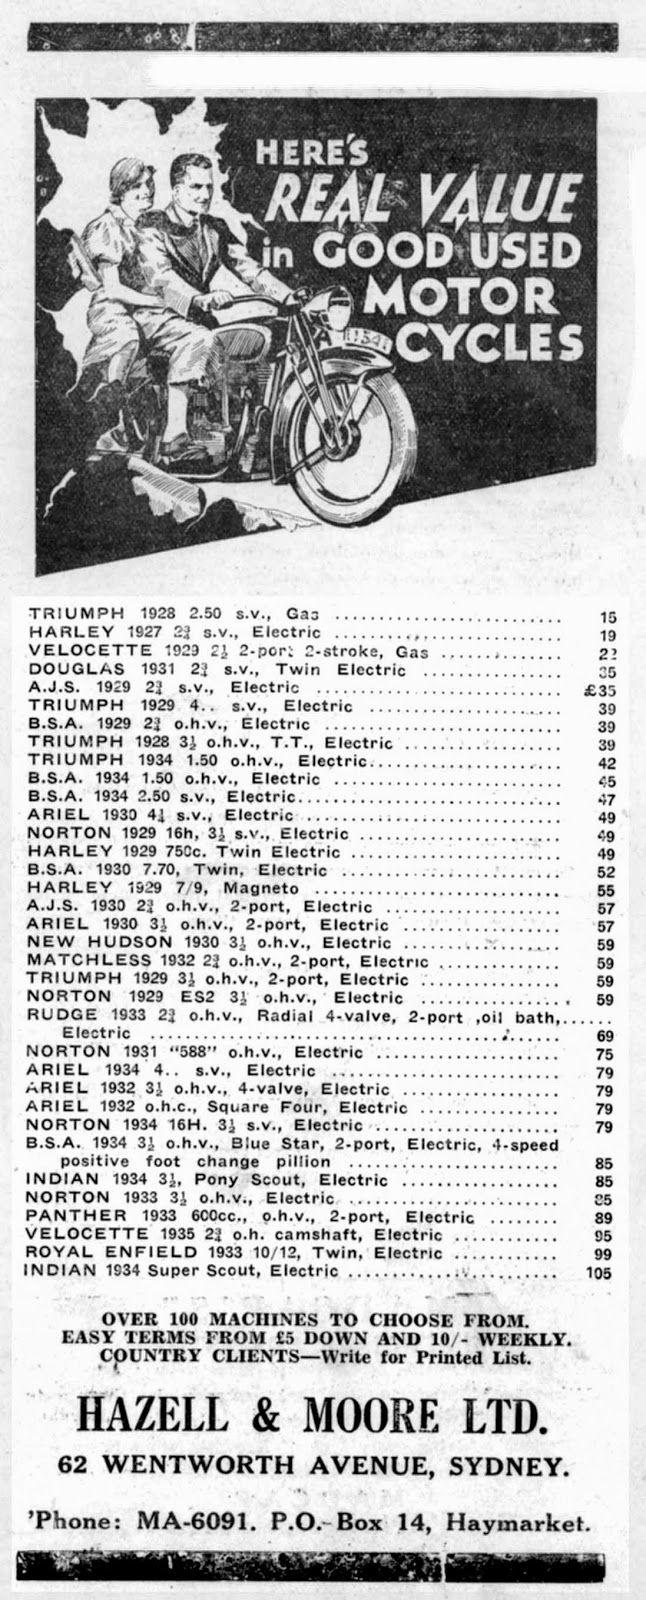 1935 Used motorcycles Australia advertisement *